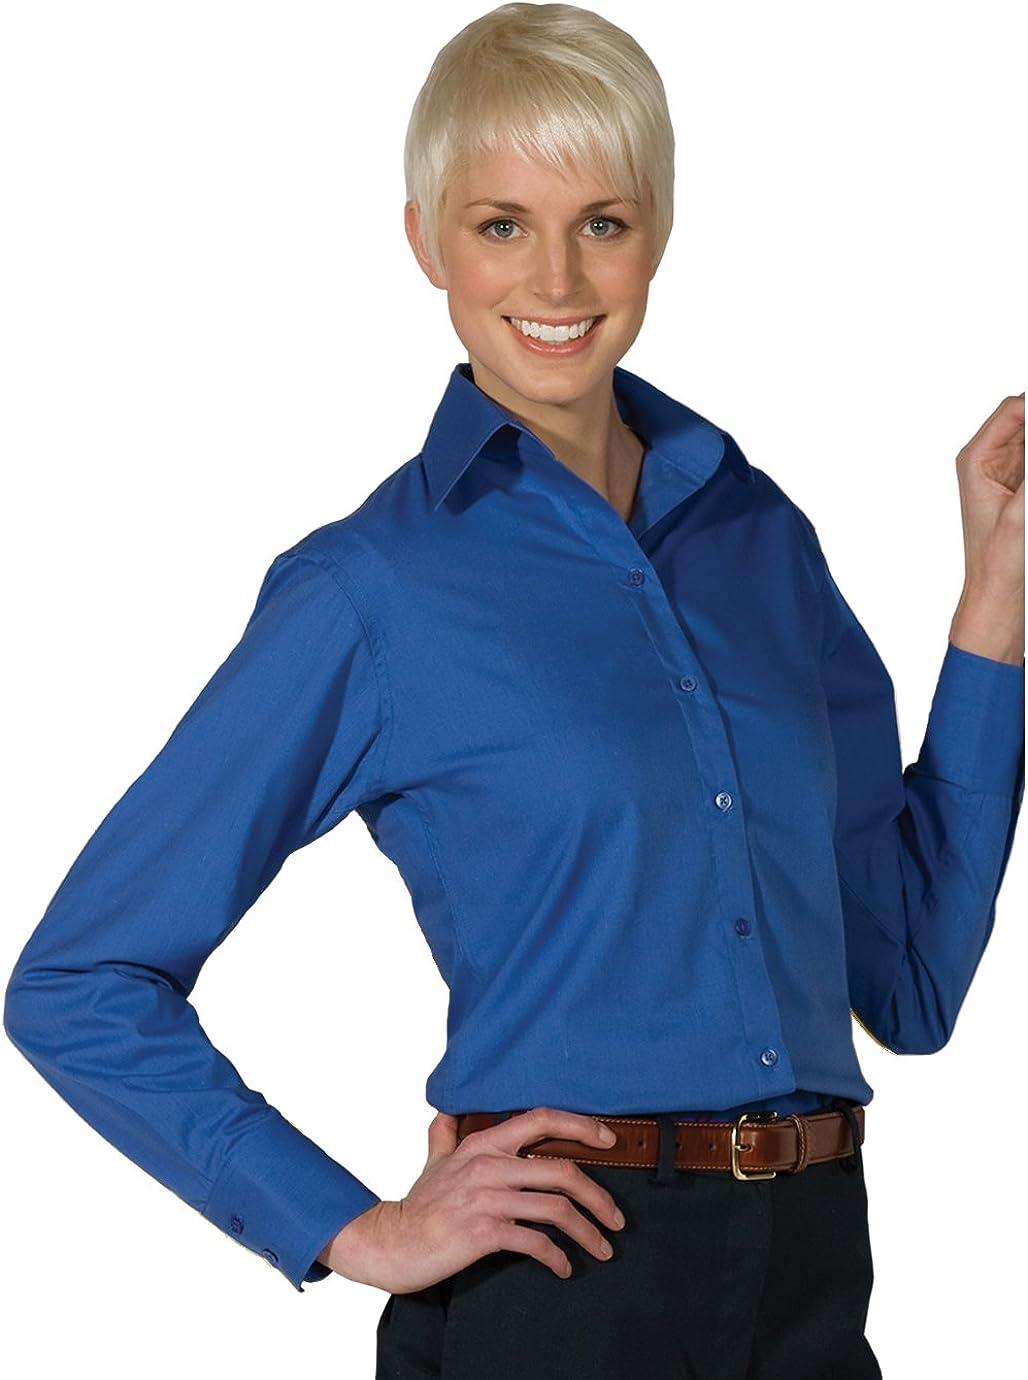 Averill's Sharper Uniforms Women's Ladies Neck Open Poplin Ranking TOP3 Resta Fixed price for sale